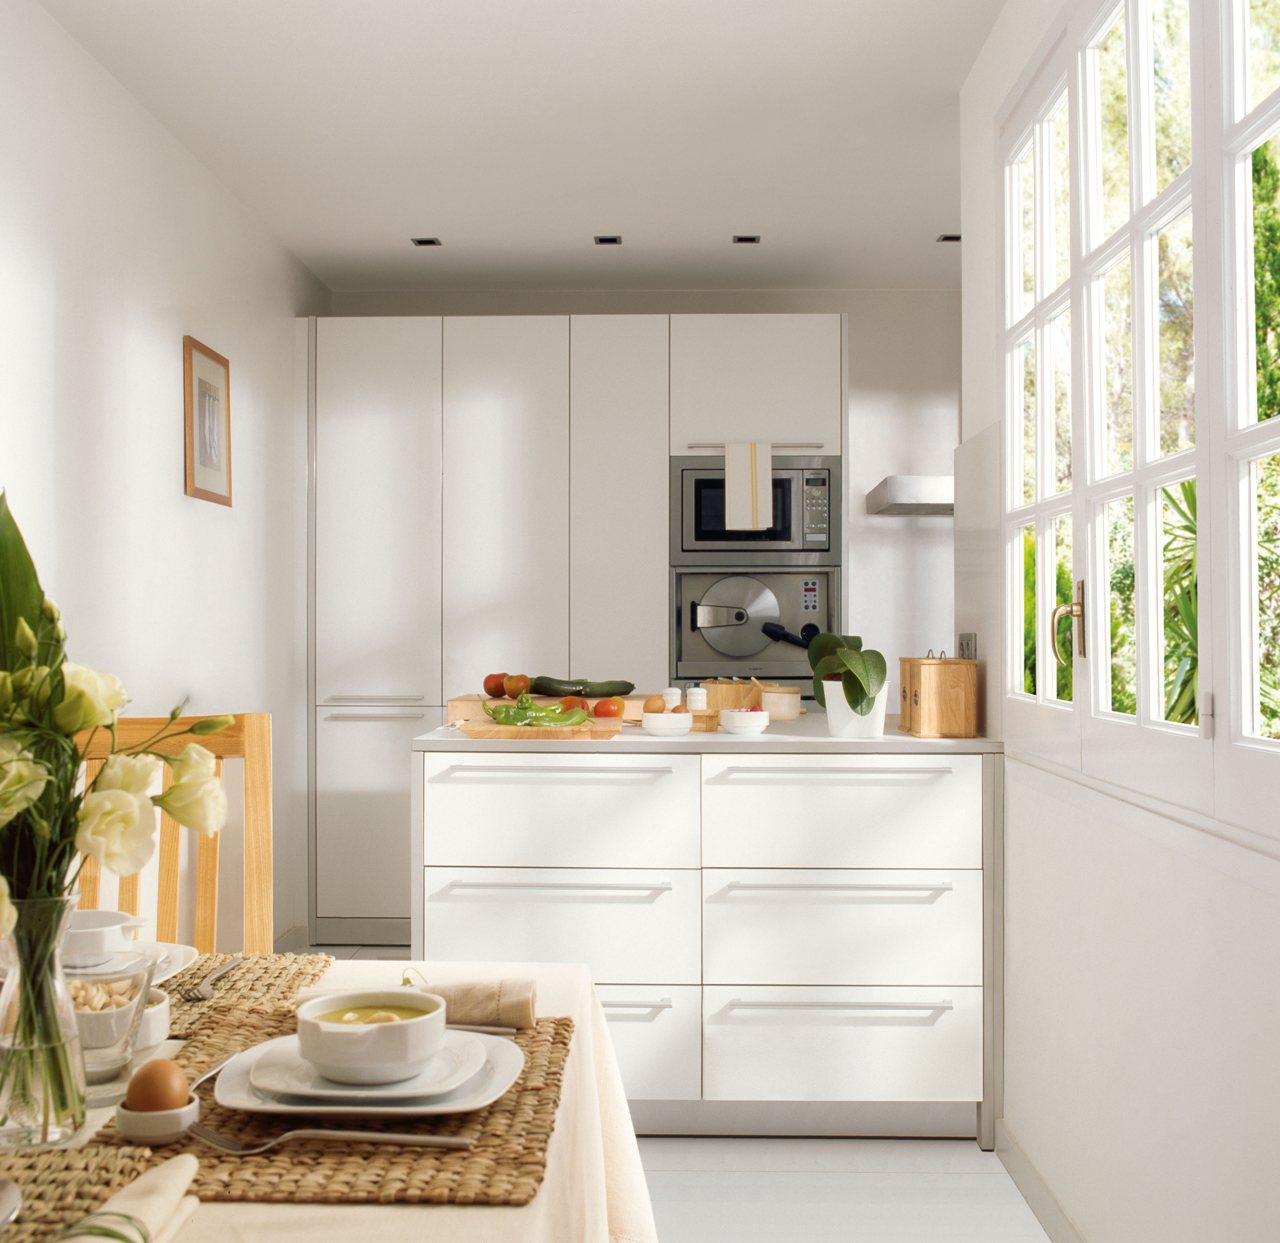 Ideas para cocinas peque as - Cocinas muy pequenas ...